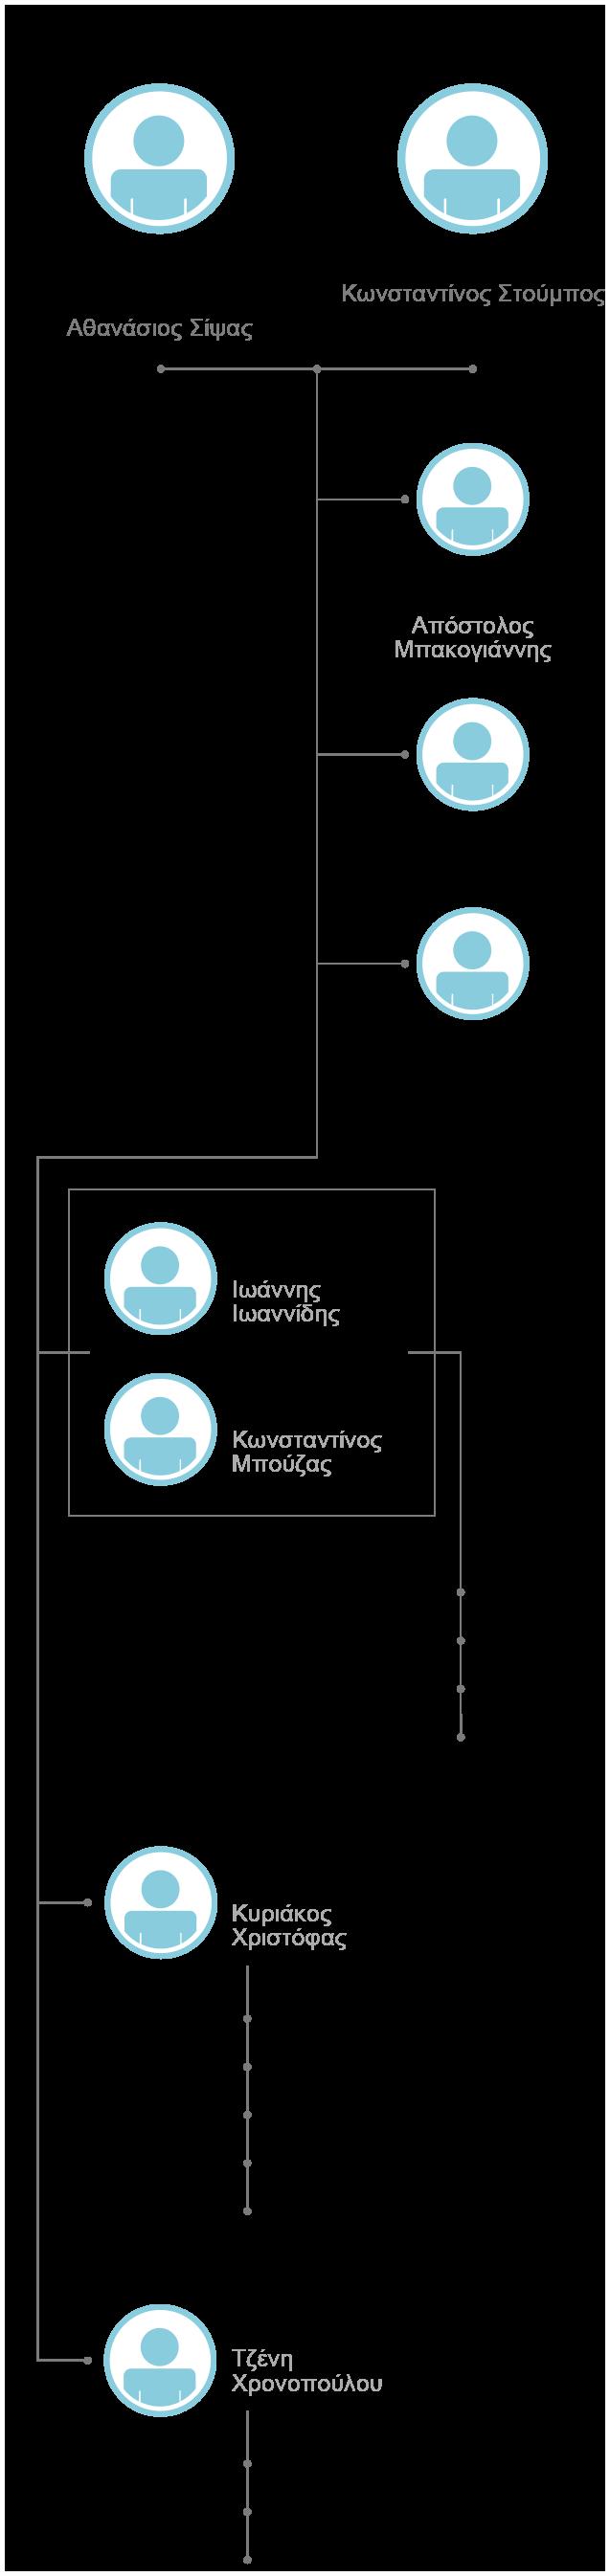 organization_chart_mob_gr